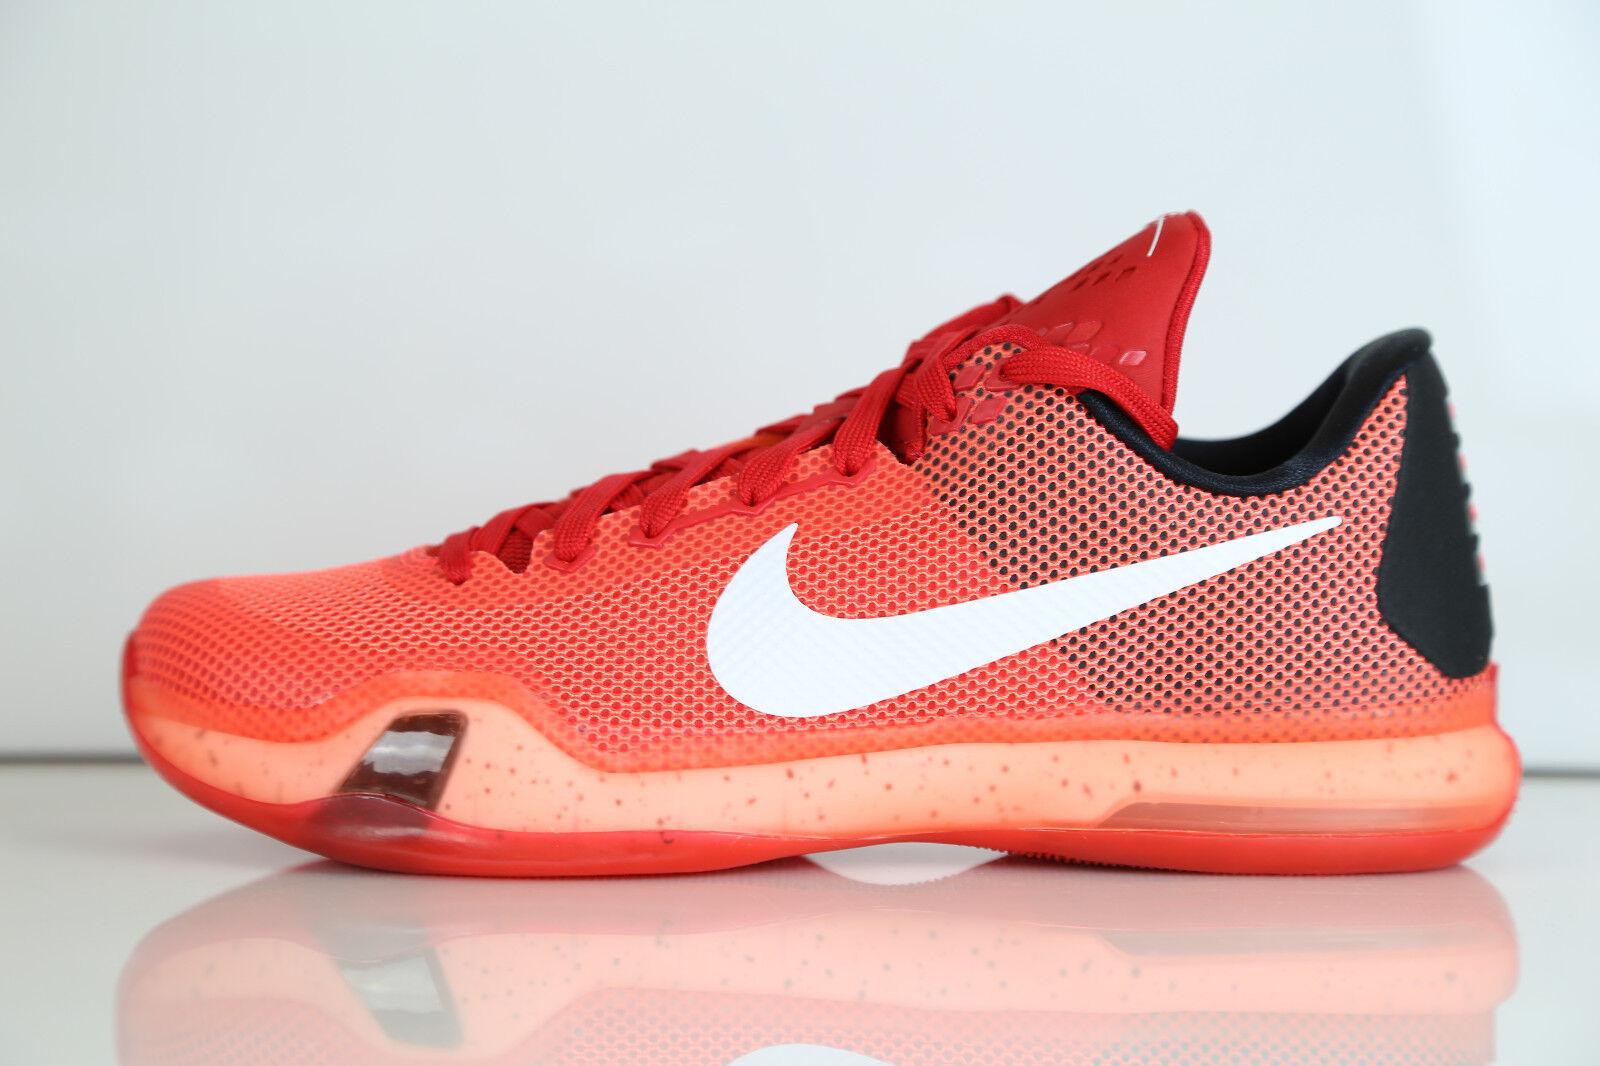 Nike Kobe X Majors University Red Bright Crimson 705317-616 8-14 10 9 8